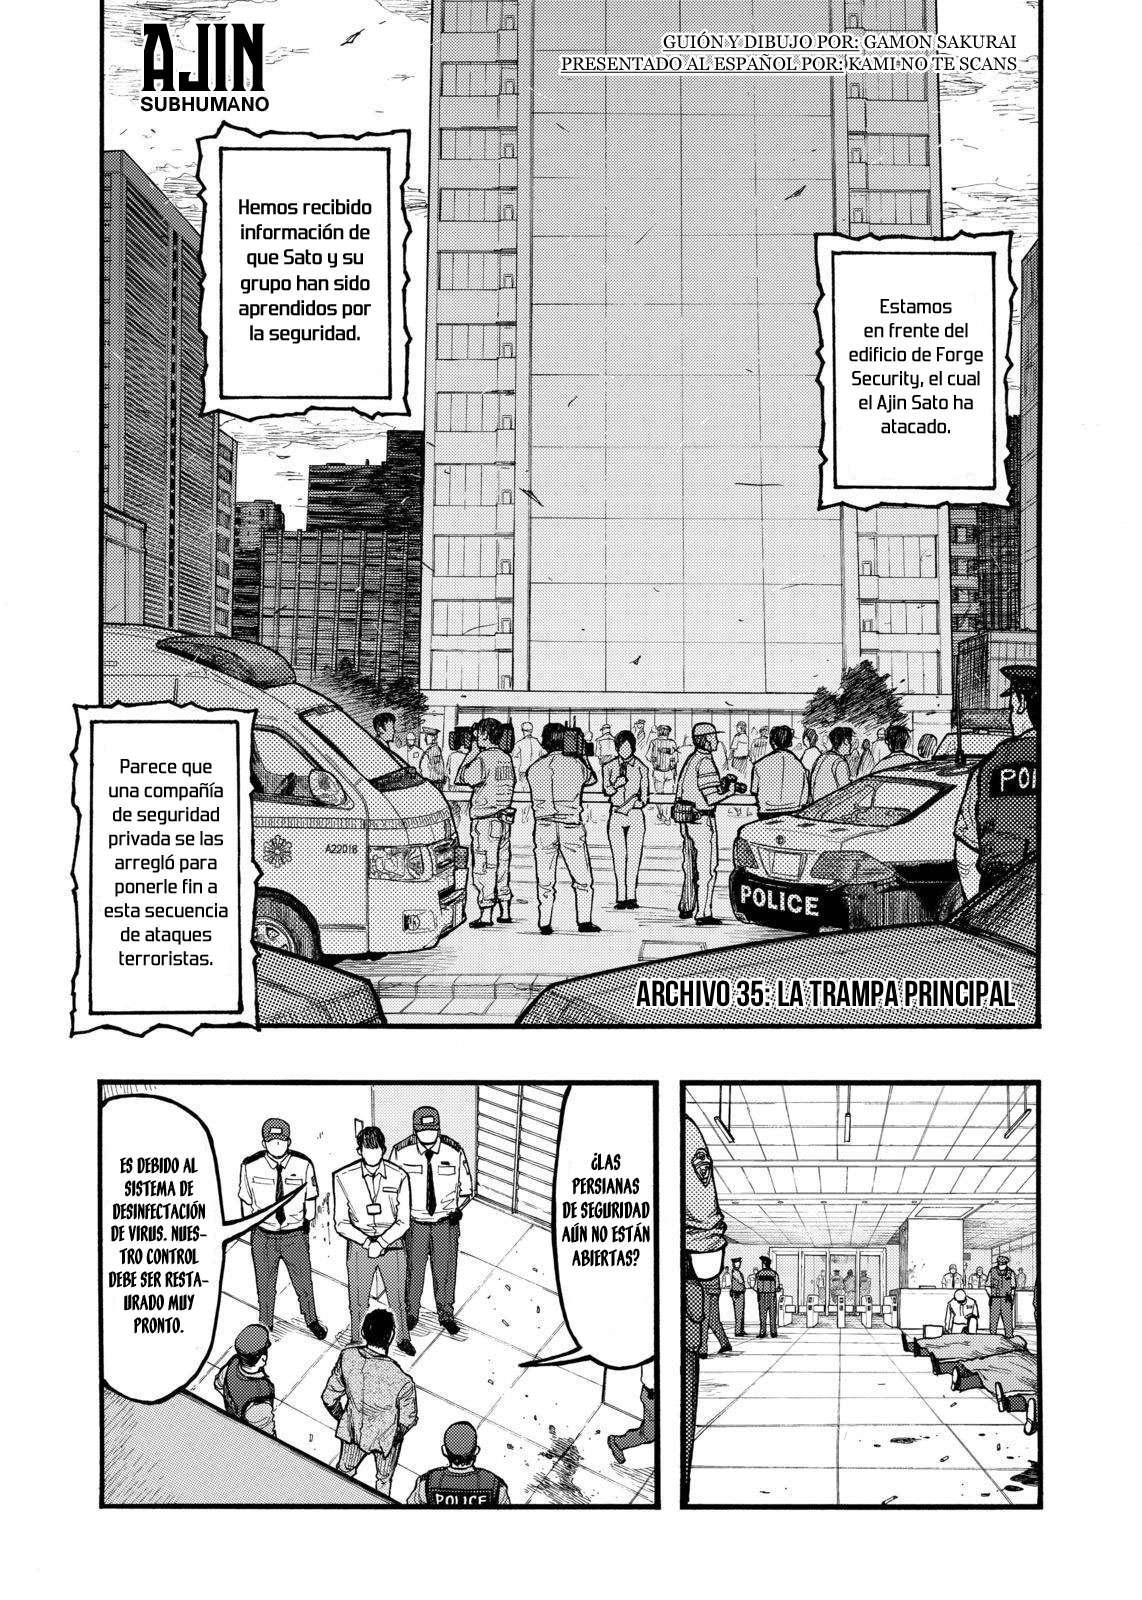 https://c5.ninemanga.com/es_manga/33/14177/432935/1d0d0d9770e958dd76149a68e579d4f3.jpg Page 2